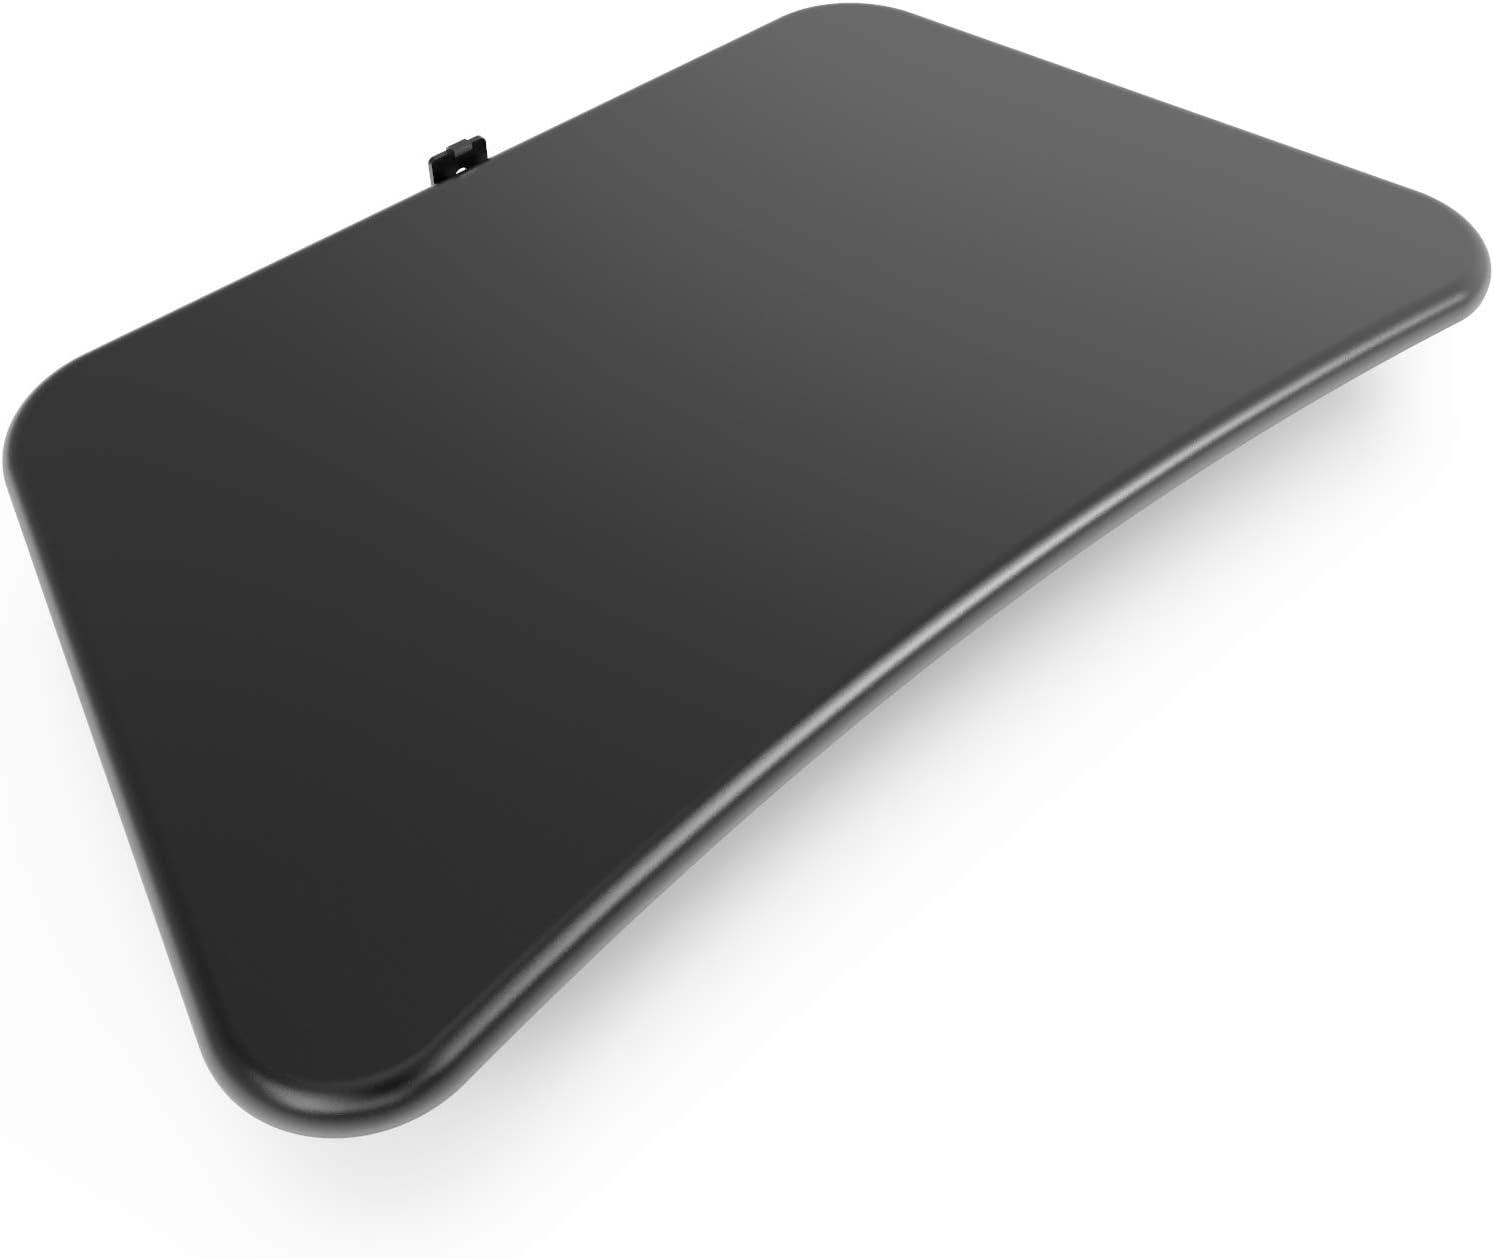 Kanto MK-KT Keyboard Tray for MKH65, MKX70, MKS70, MKT65 & MKT70 Mobile/Stationary/Bolt-Down TV Floor Stands   MK Series Accessory